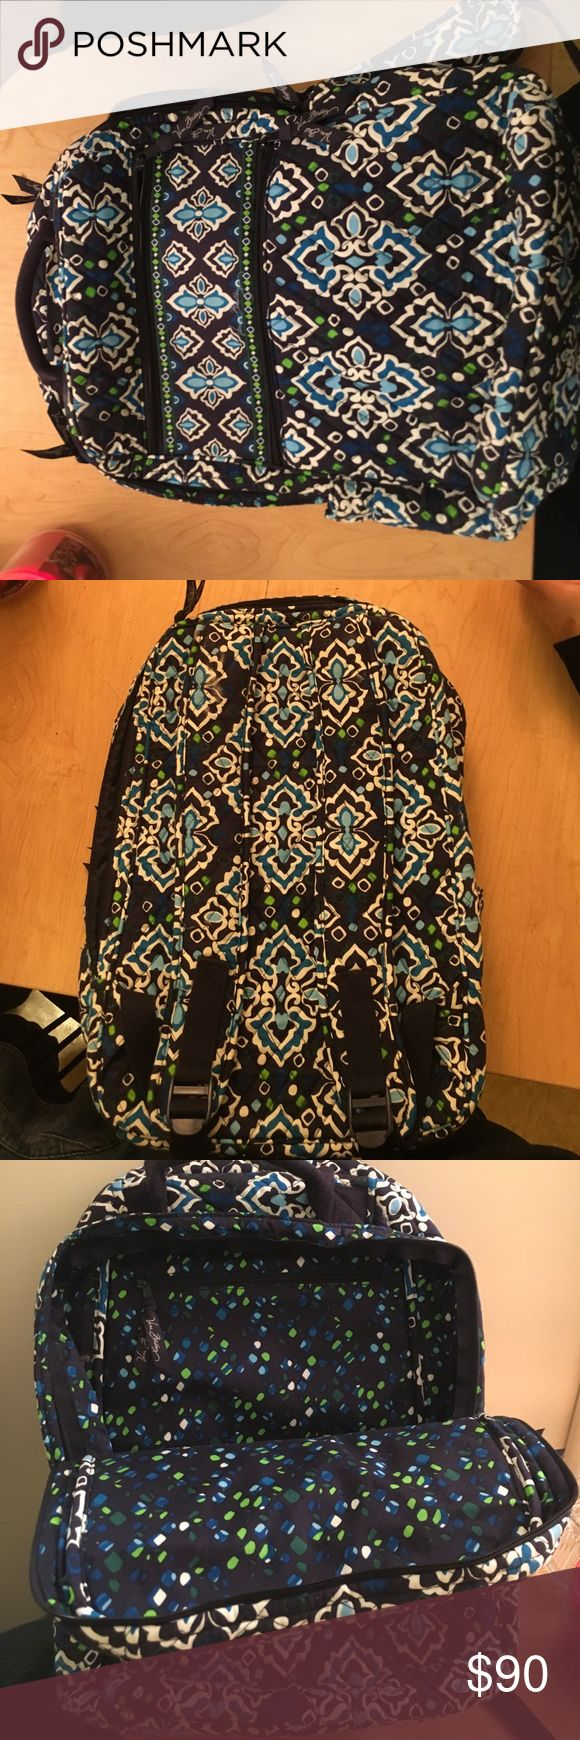 Vera Bradley, laptop backpack Newest Vera Bradley …